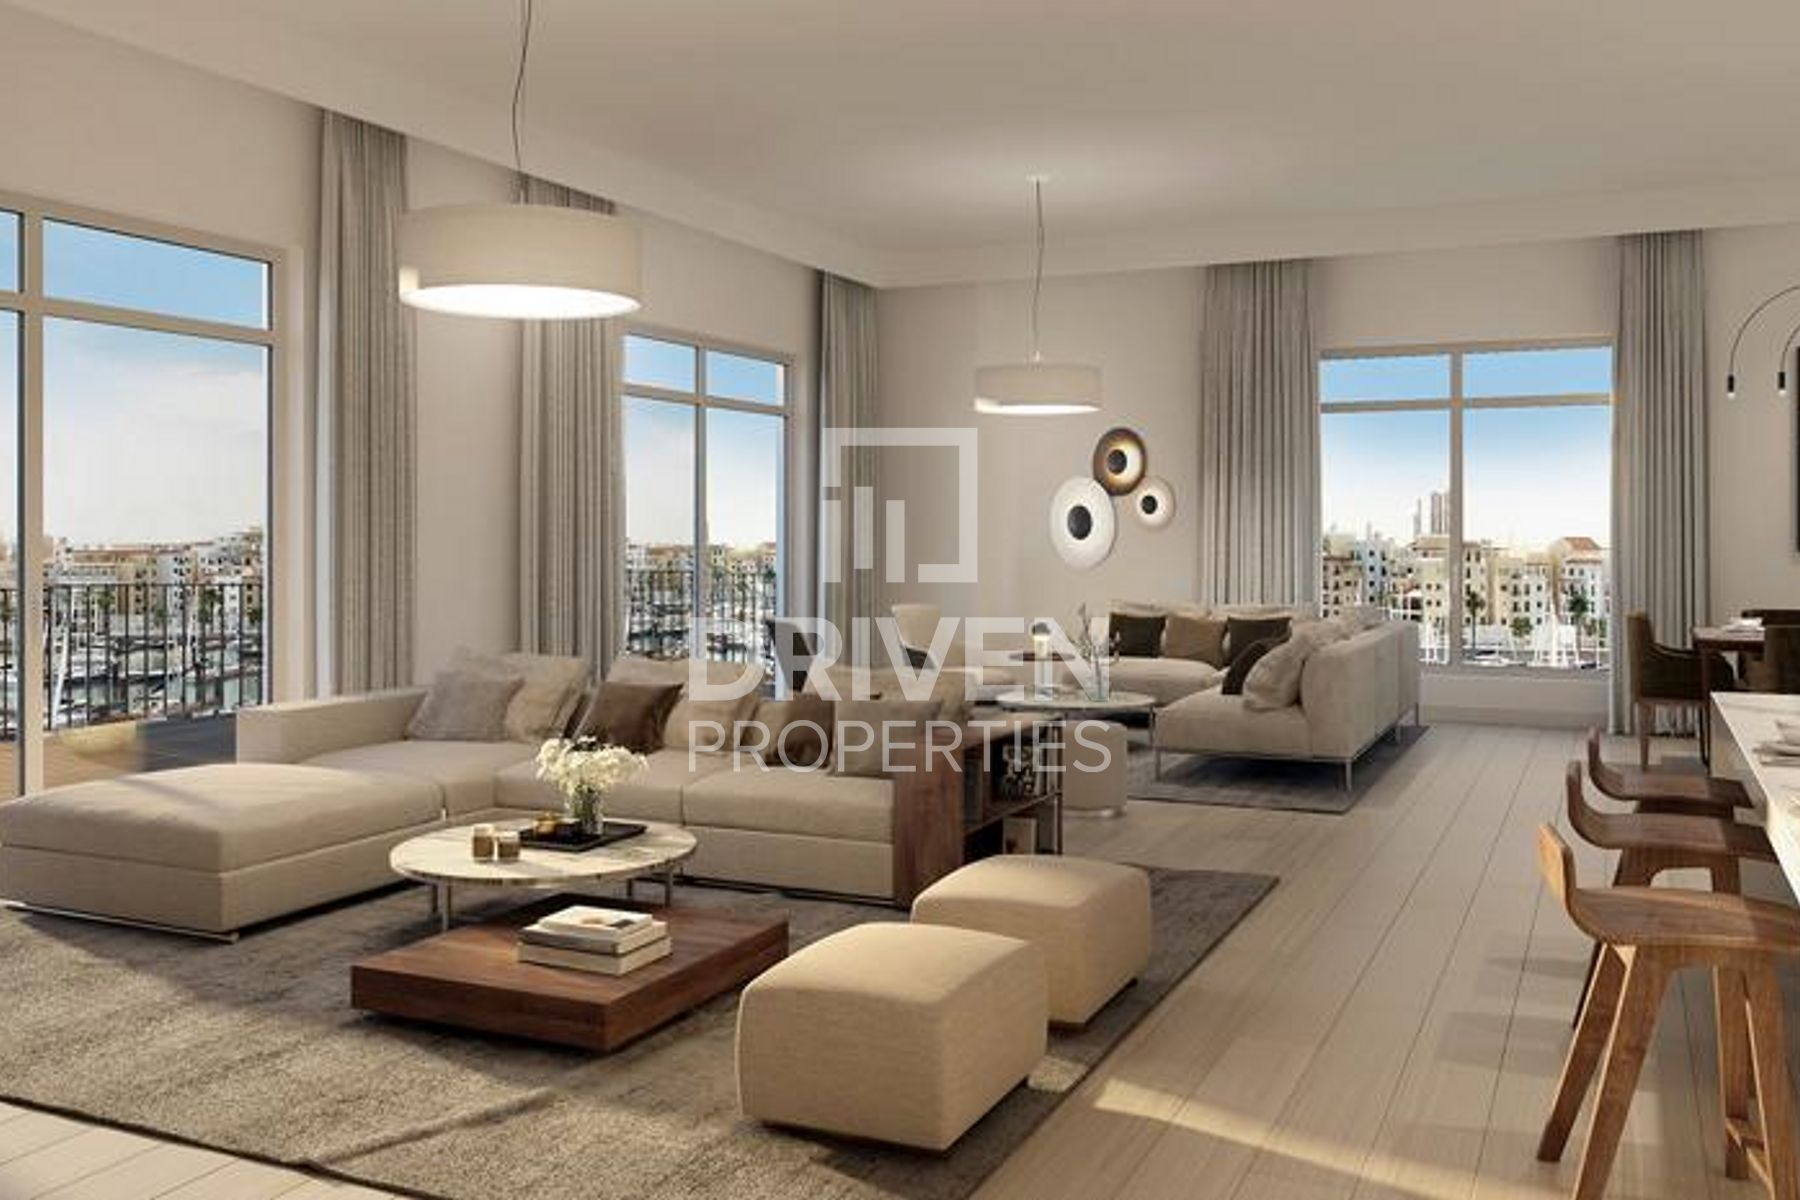 Luxurious Living with Skyline Marina View